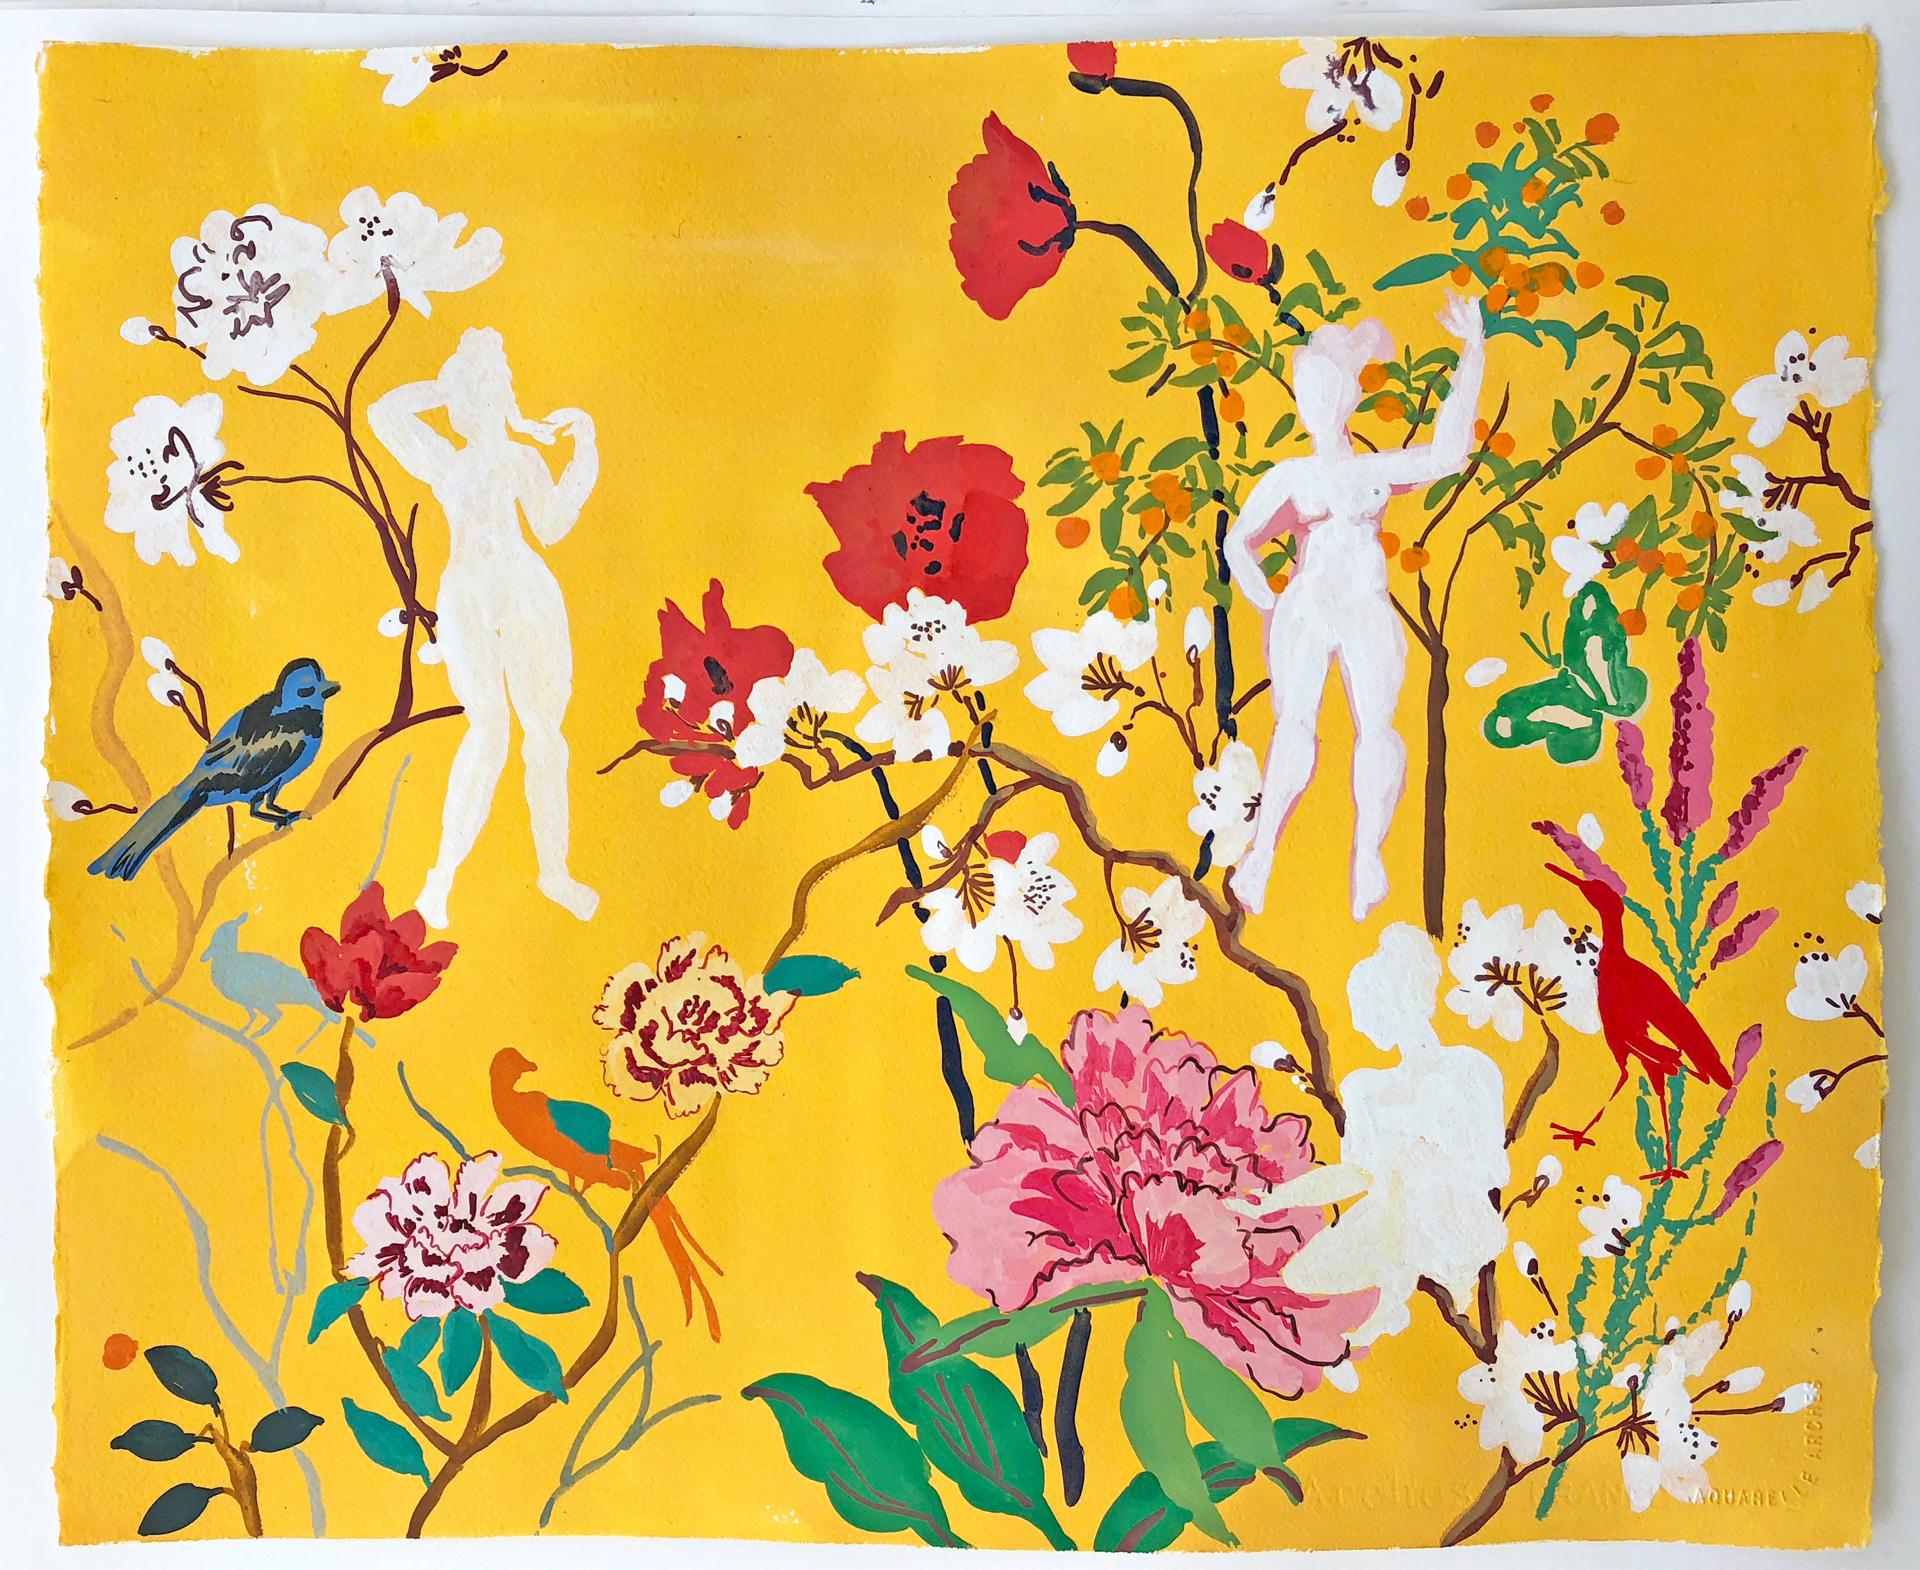 Marigold by Melanie Parke